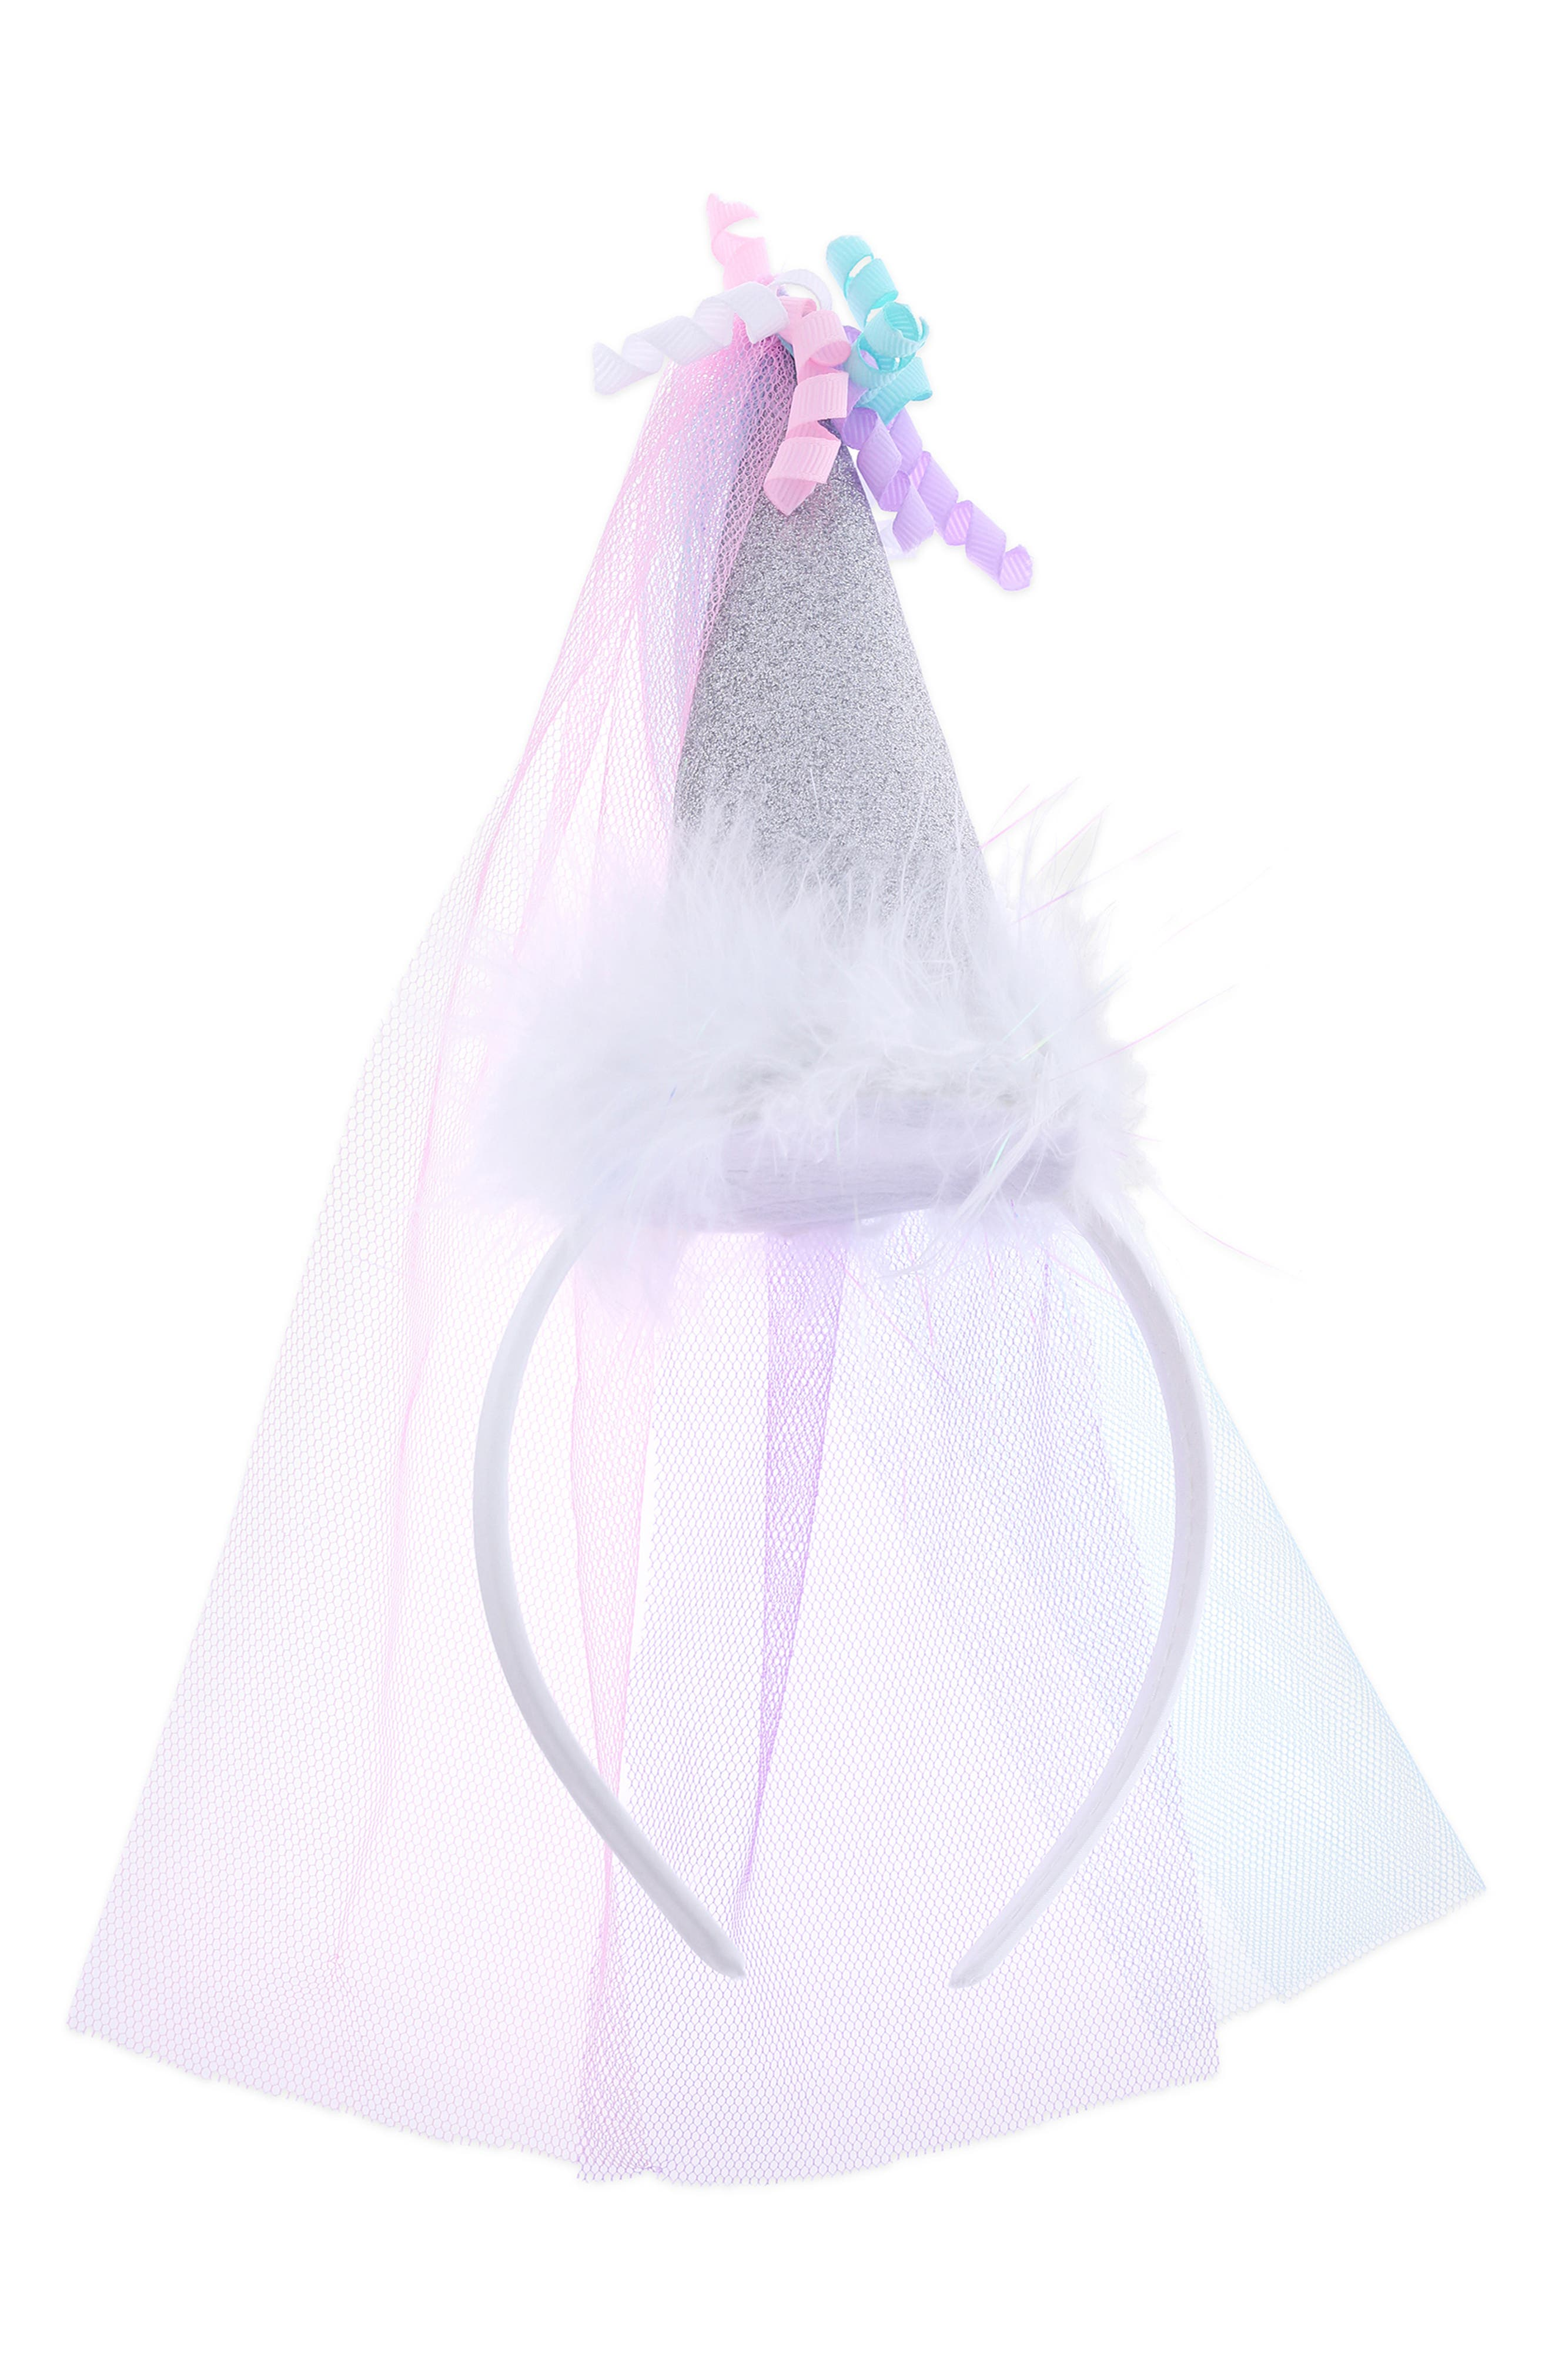 Glitter Birthday Hat & Veil,                             Main thumbnail 1, color,                             PALE MULTI